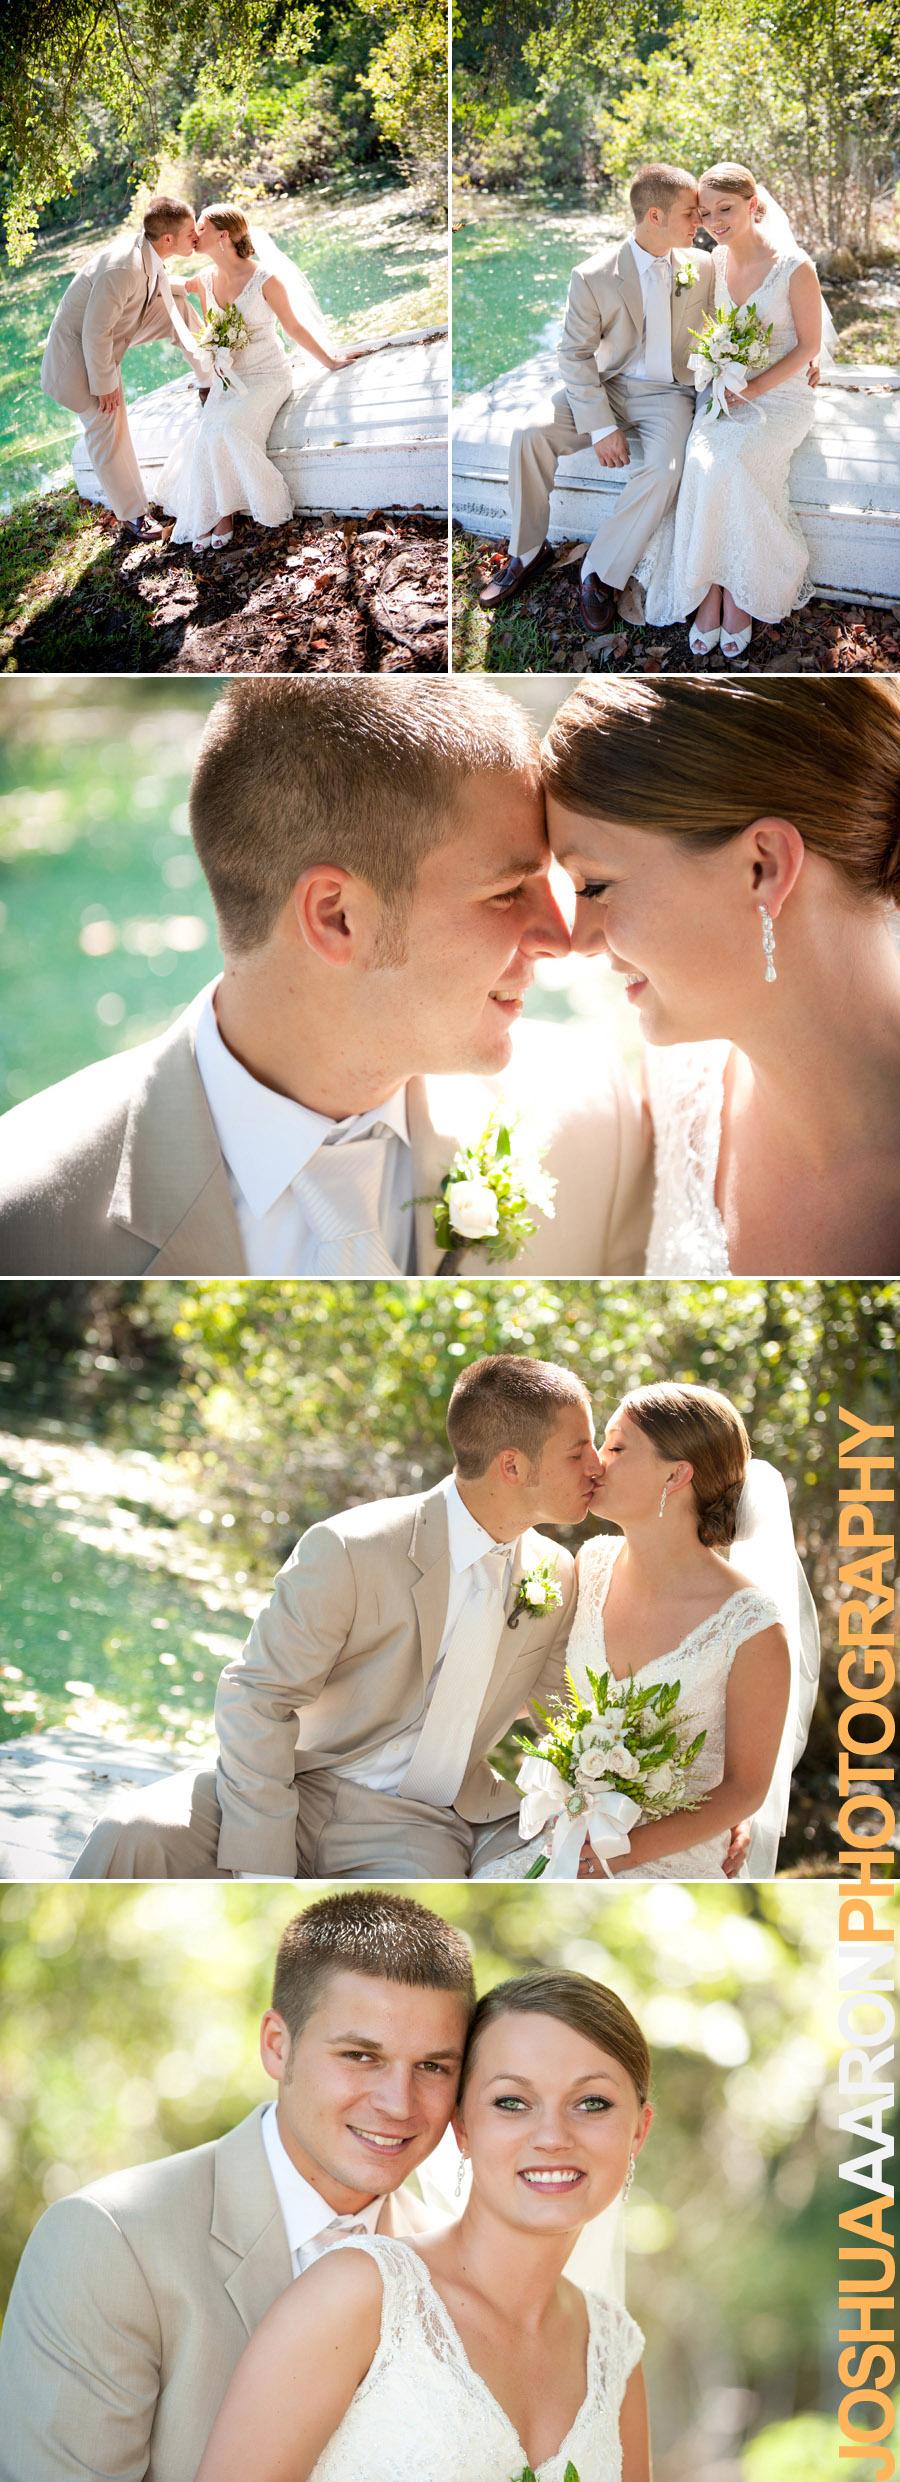 Wedding in Leesville South Carolina